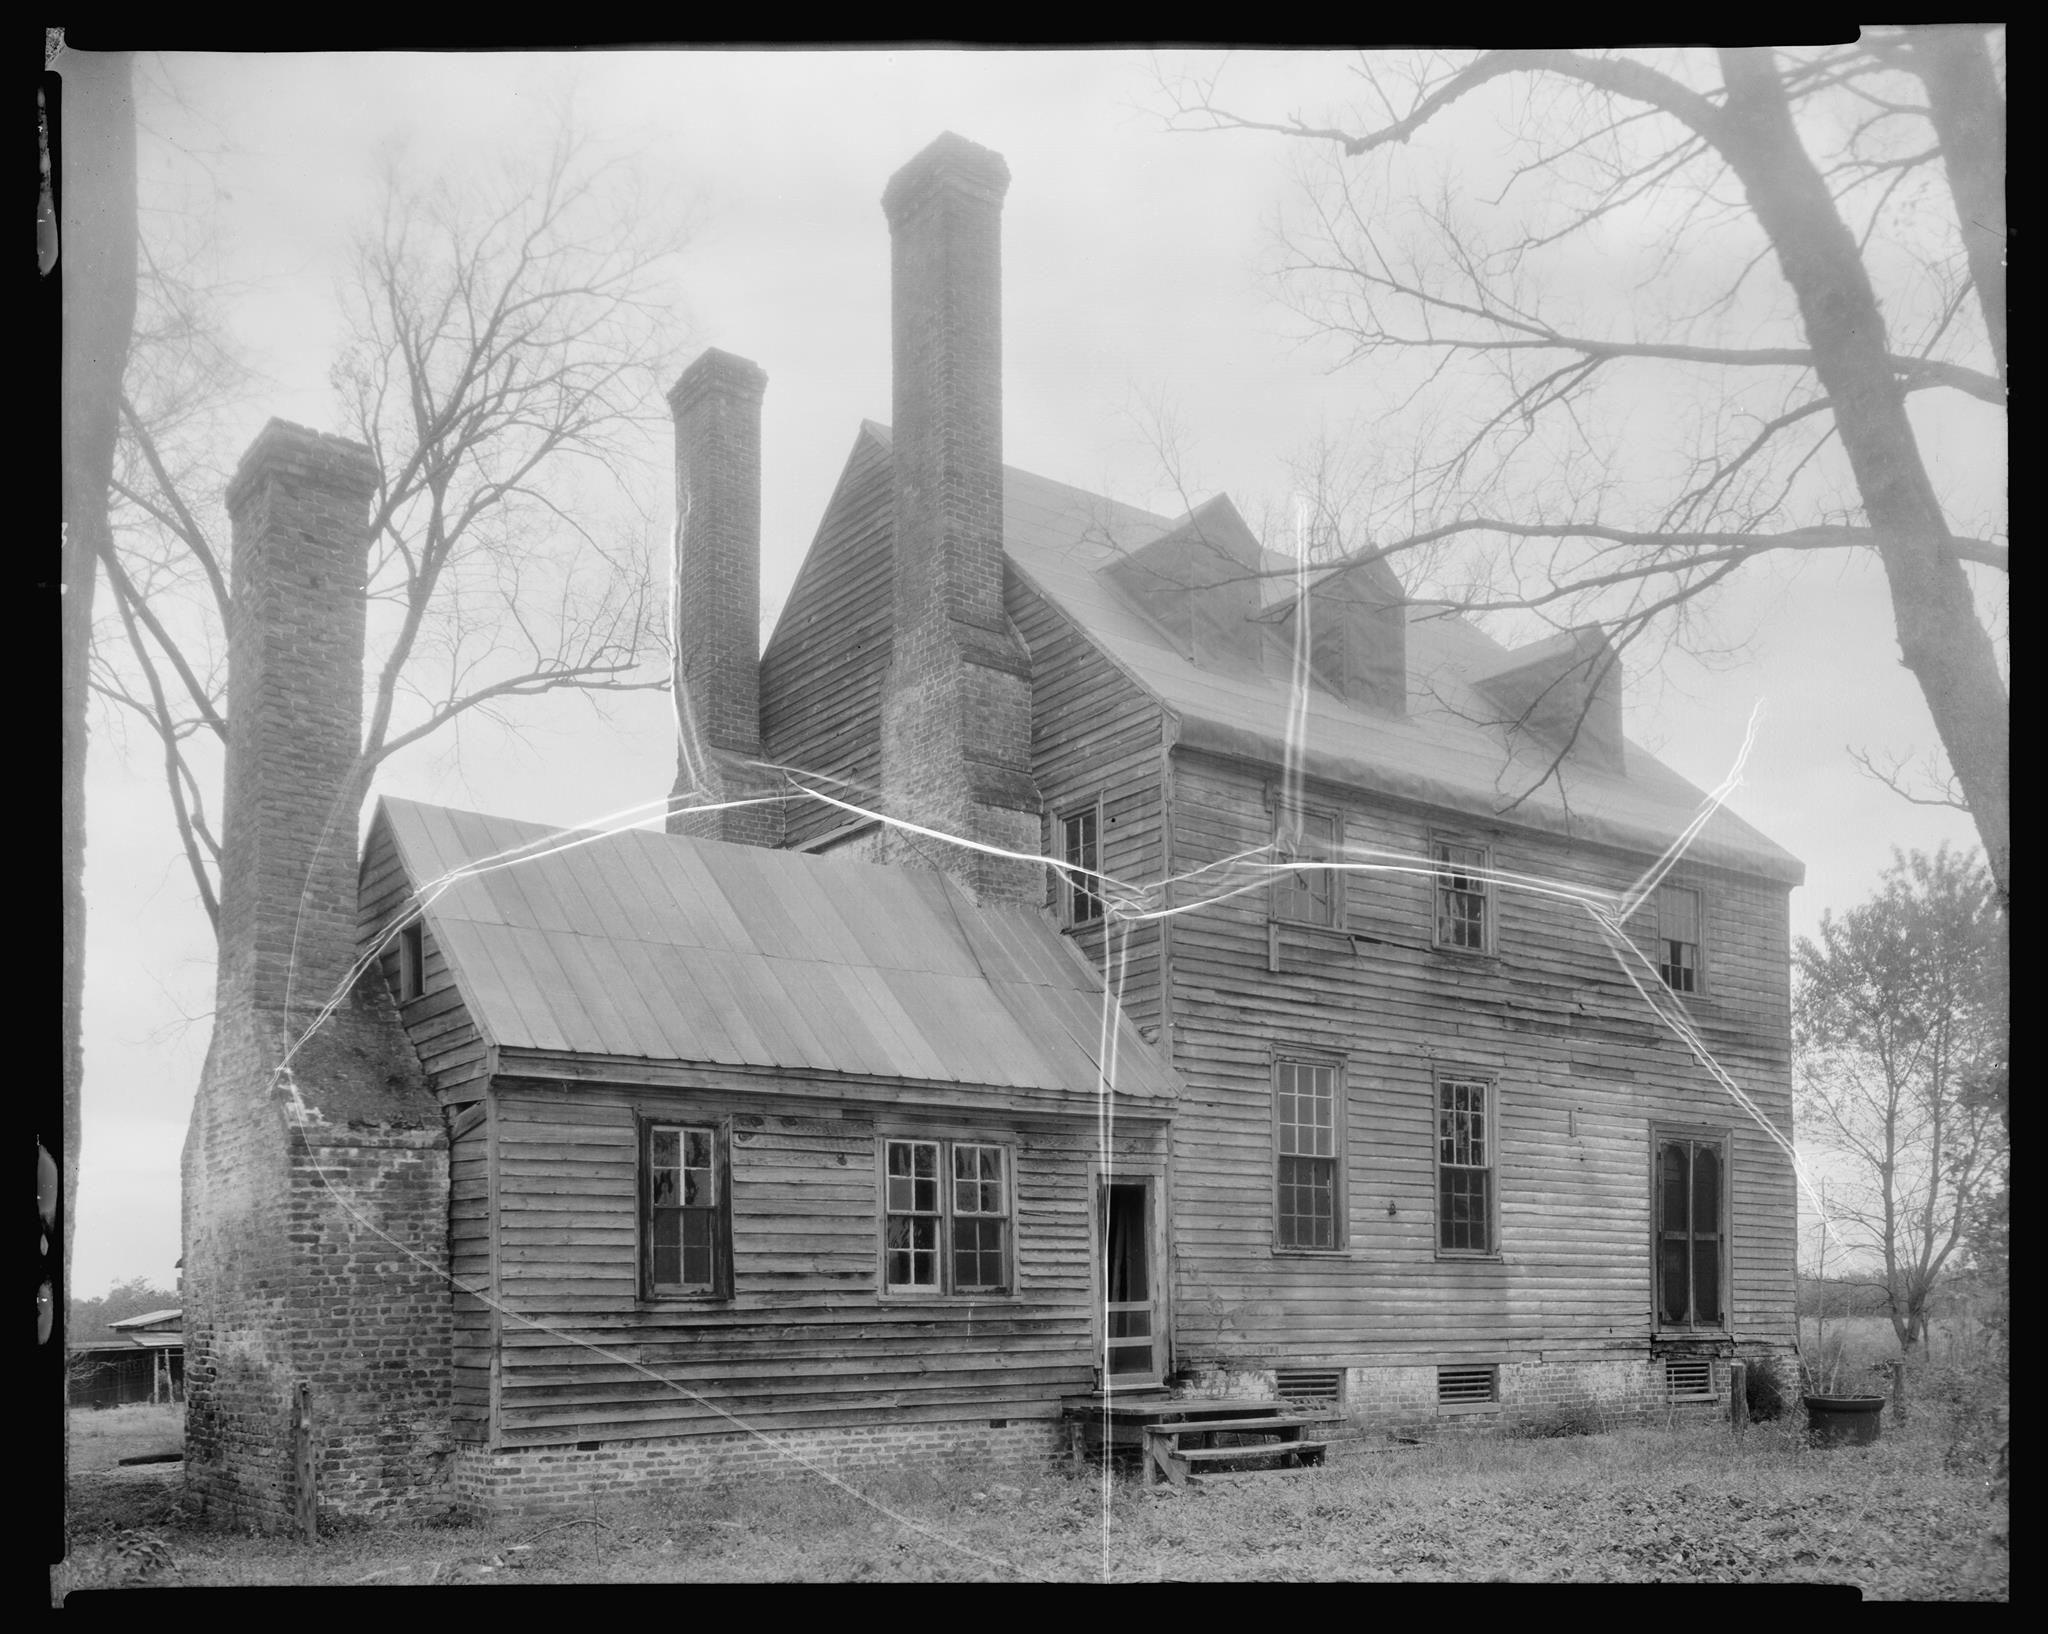 Pin on Virginia Houses & Plantations